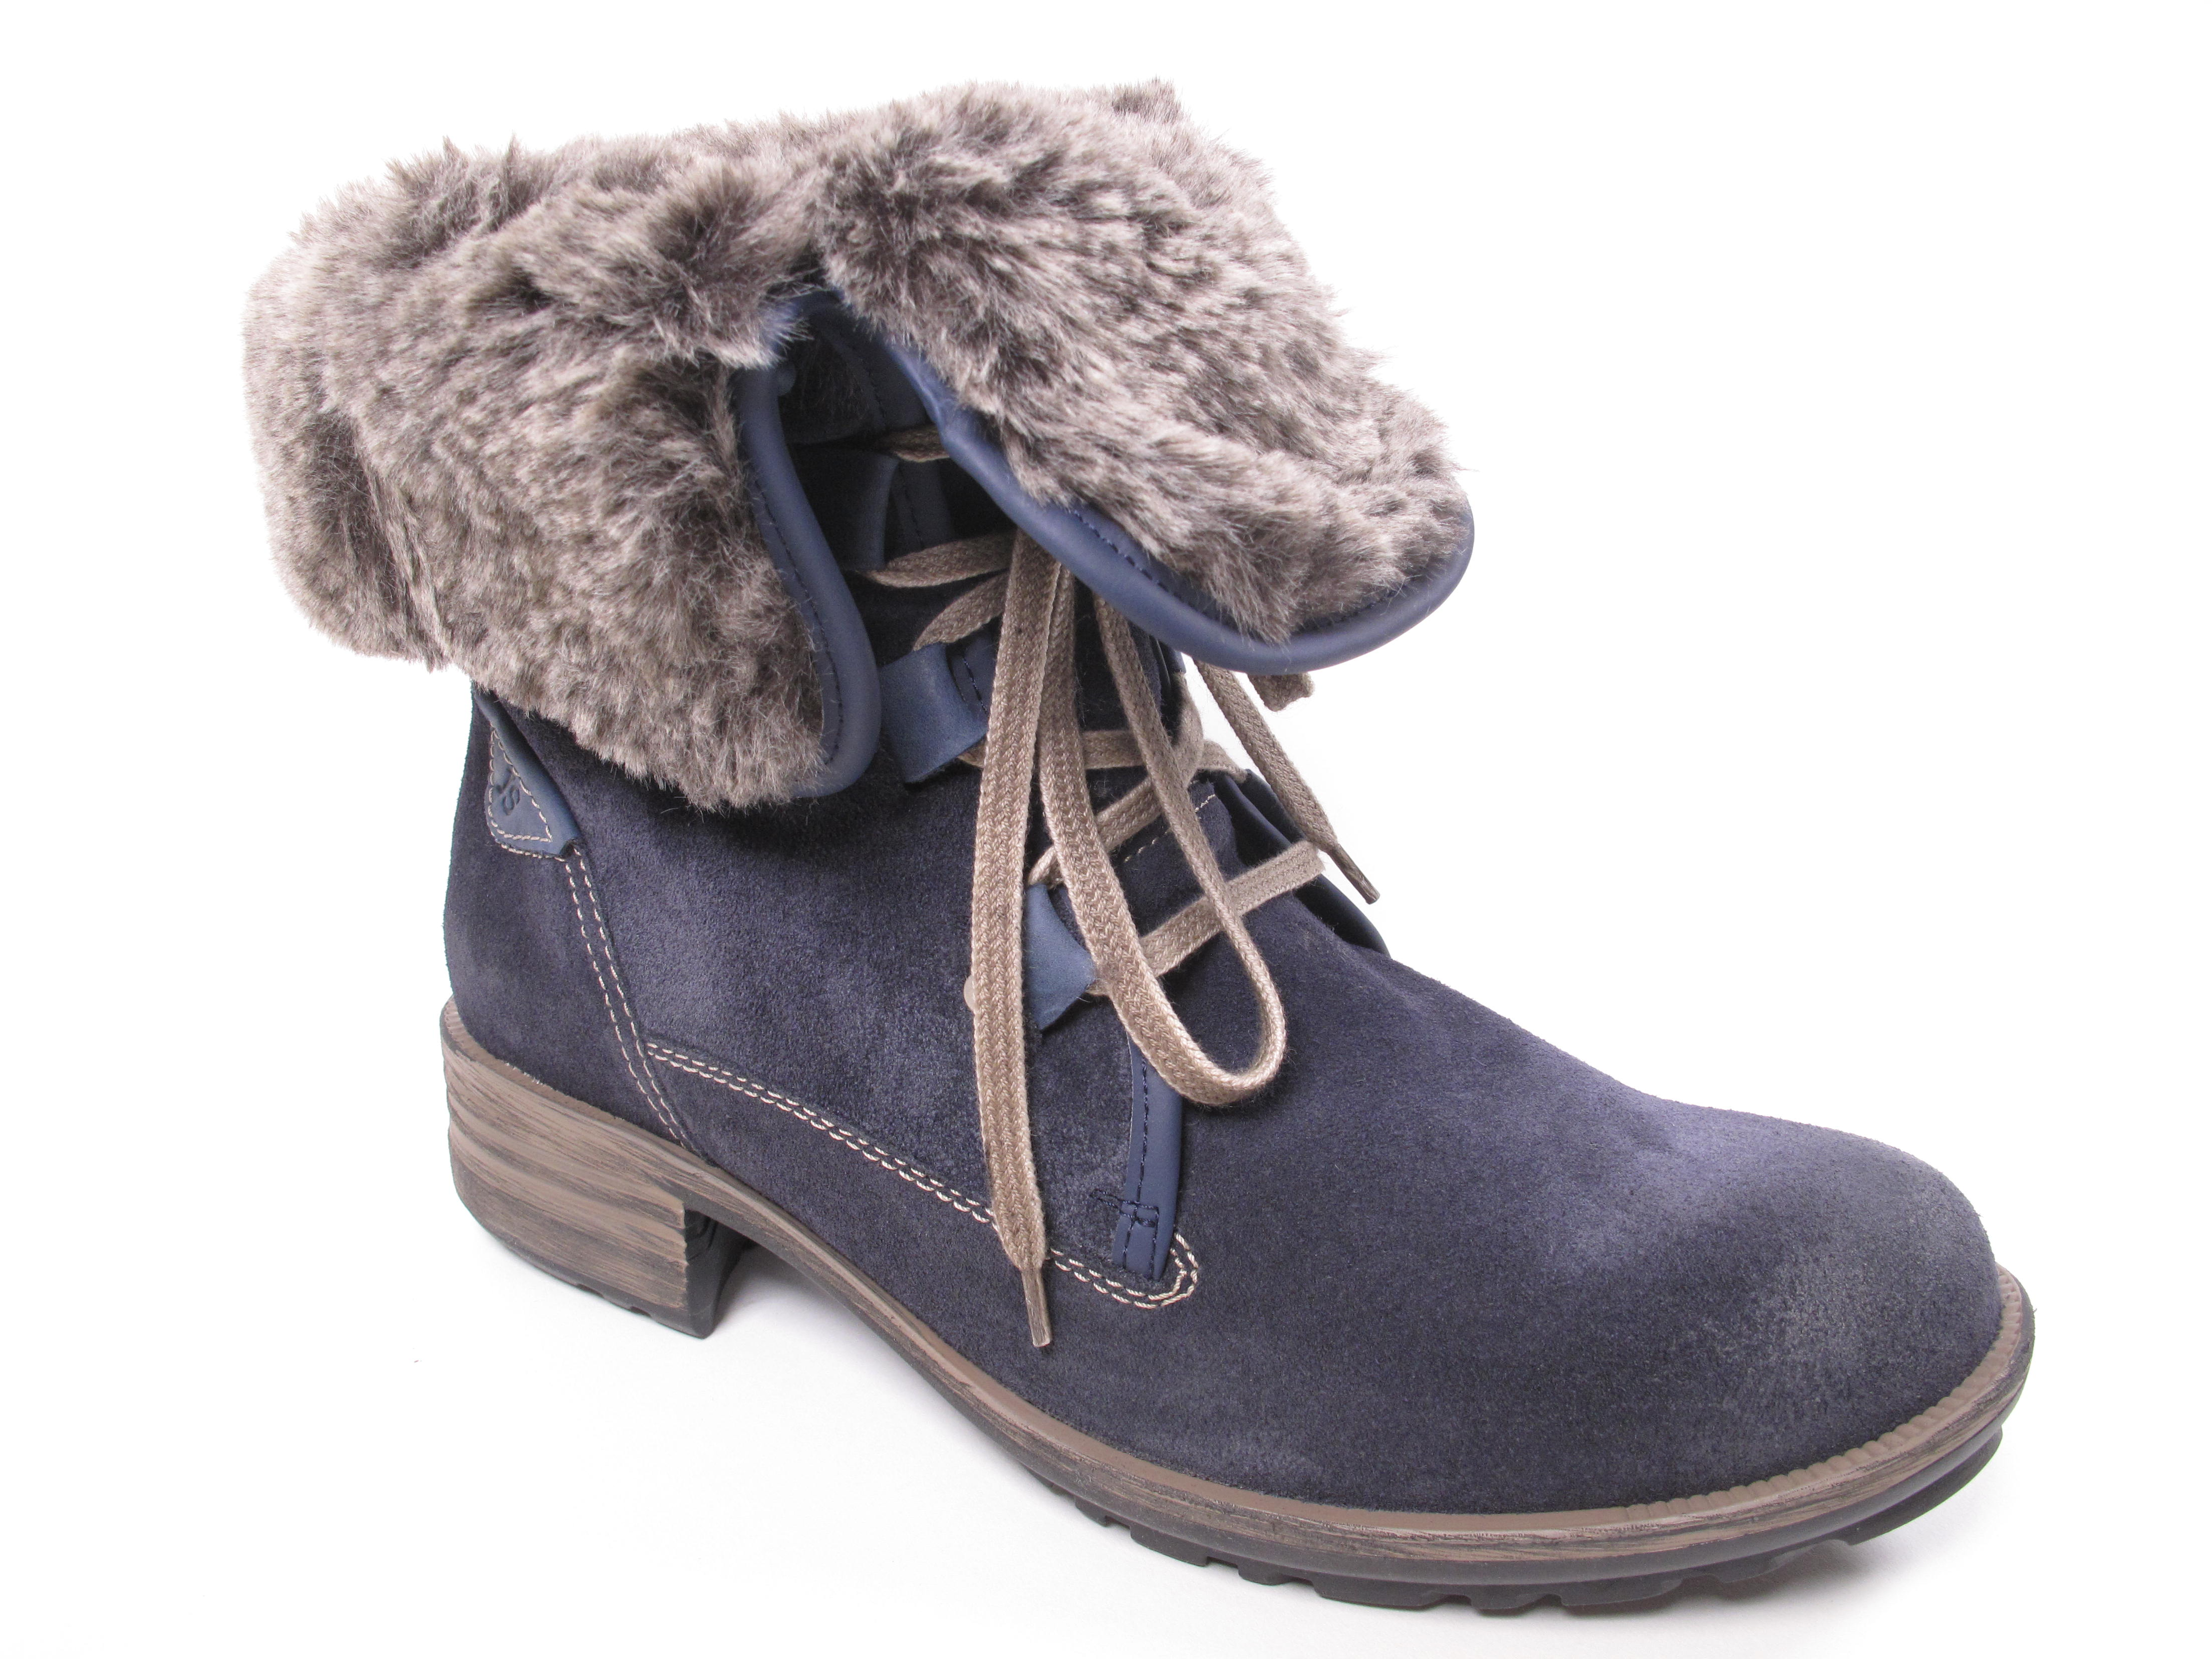 Josef invierno Seibel sandra señora botas botines botas de invierno Josef 93688pl949/596 azul b4d653